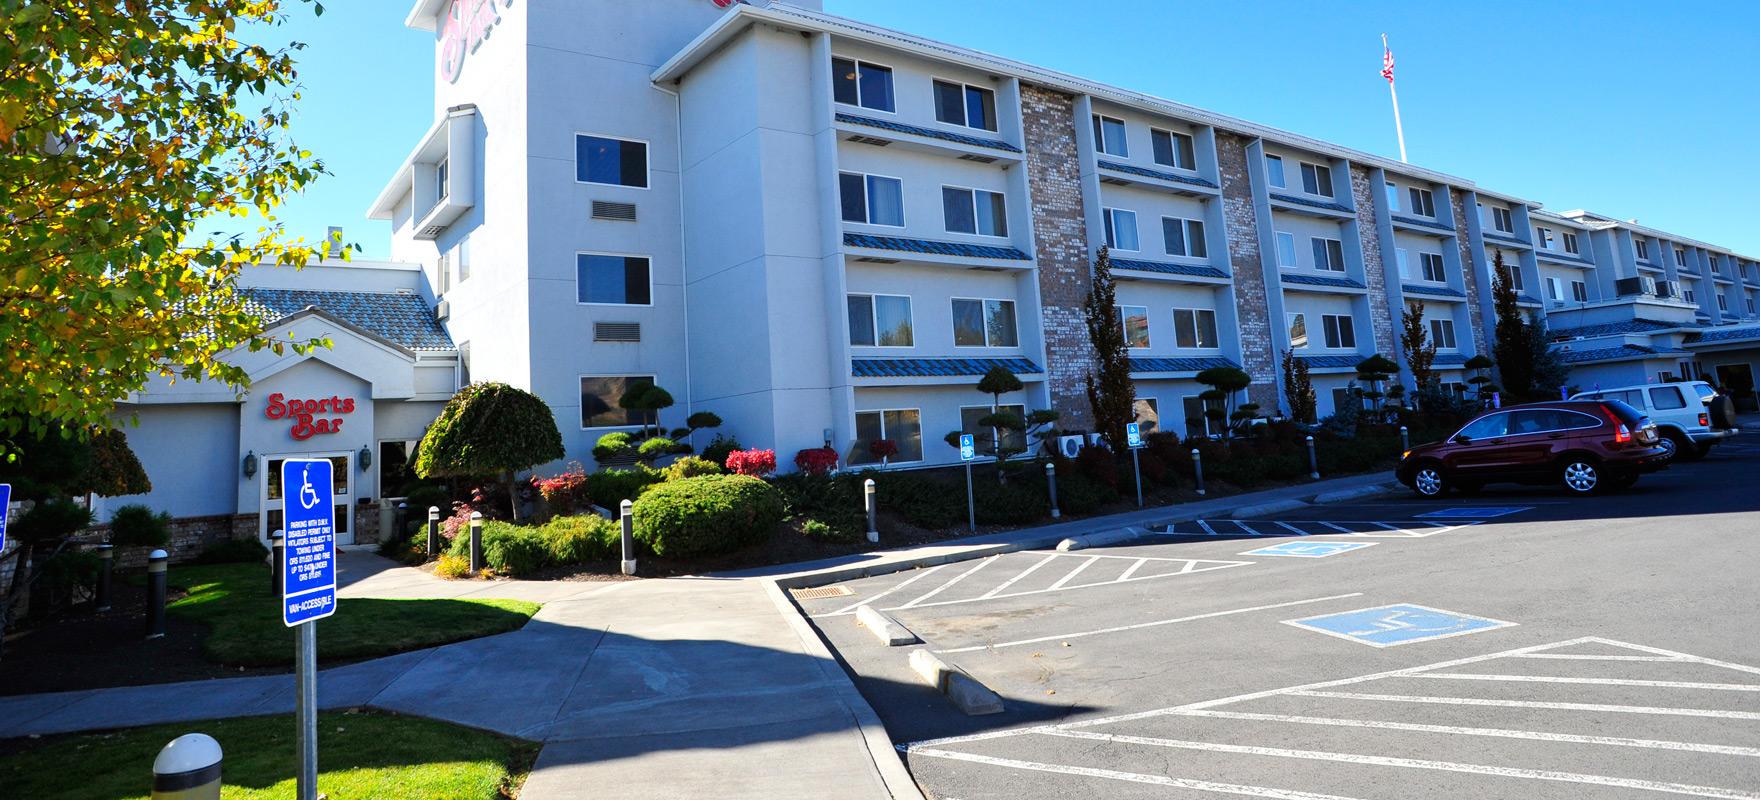 Shilo Inn Rose Garden 21 Photos 29 Reviews Hotels 1506 Ne 2nd Ave Lloyd  District Portland. Delmonte Hotel Group